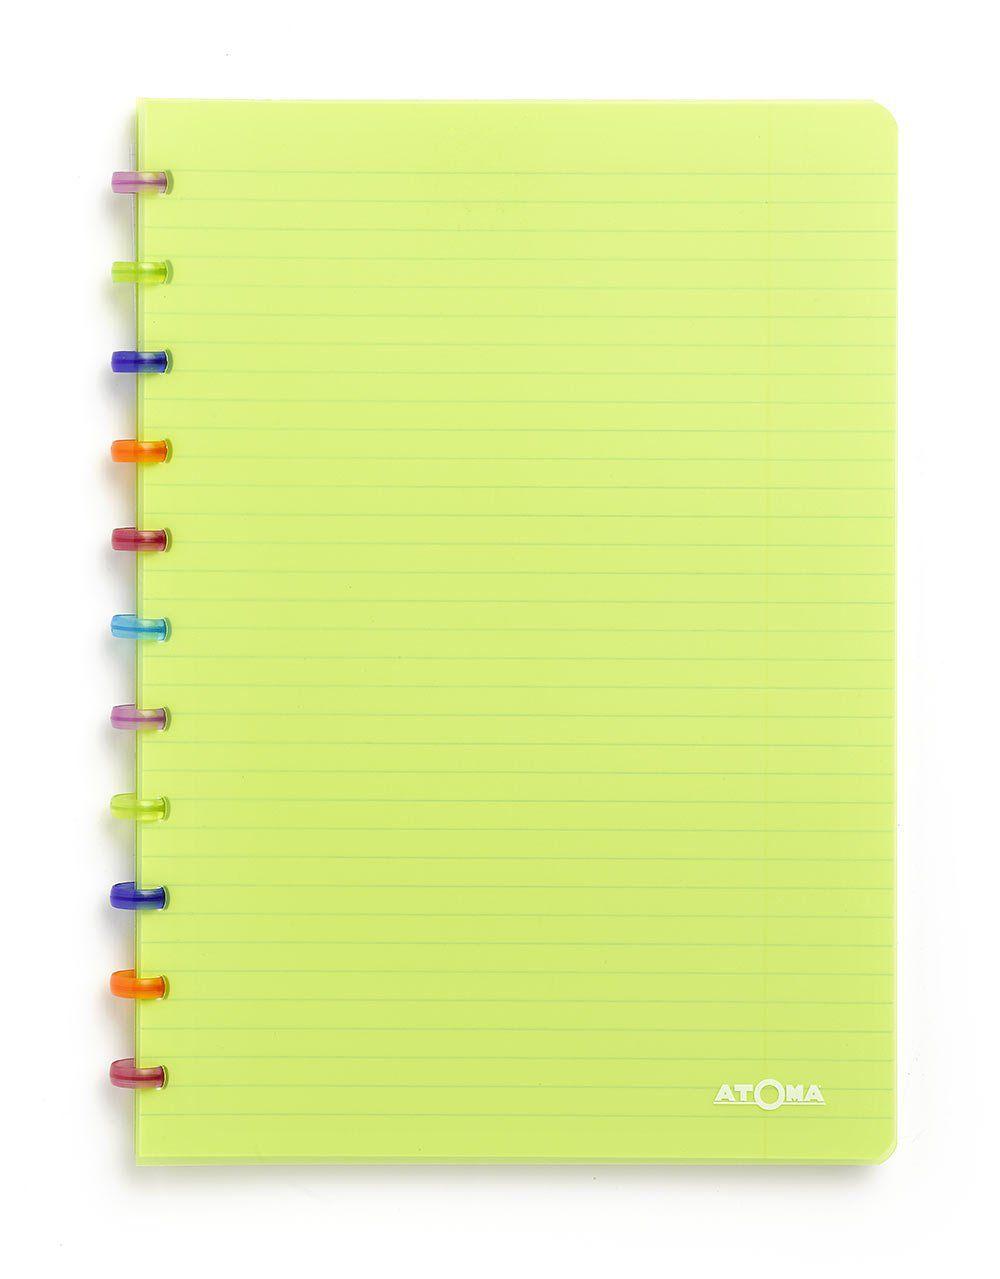 Caderno A4 72 fls verde TUTTI FRUTI Atoma